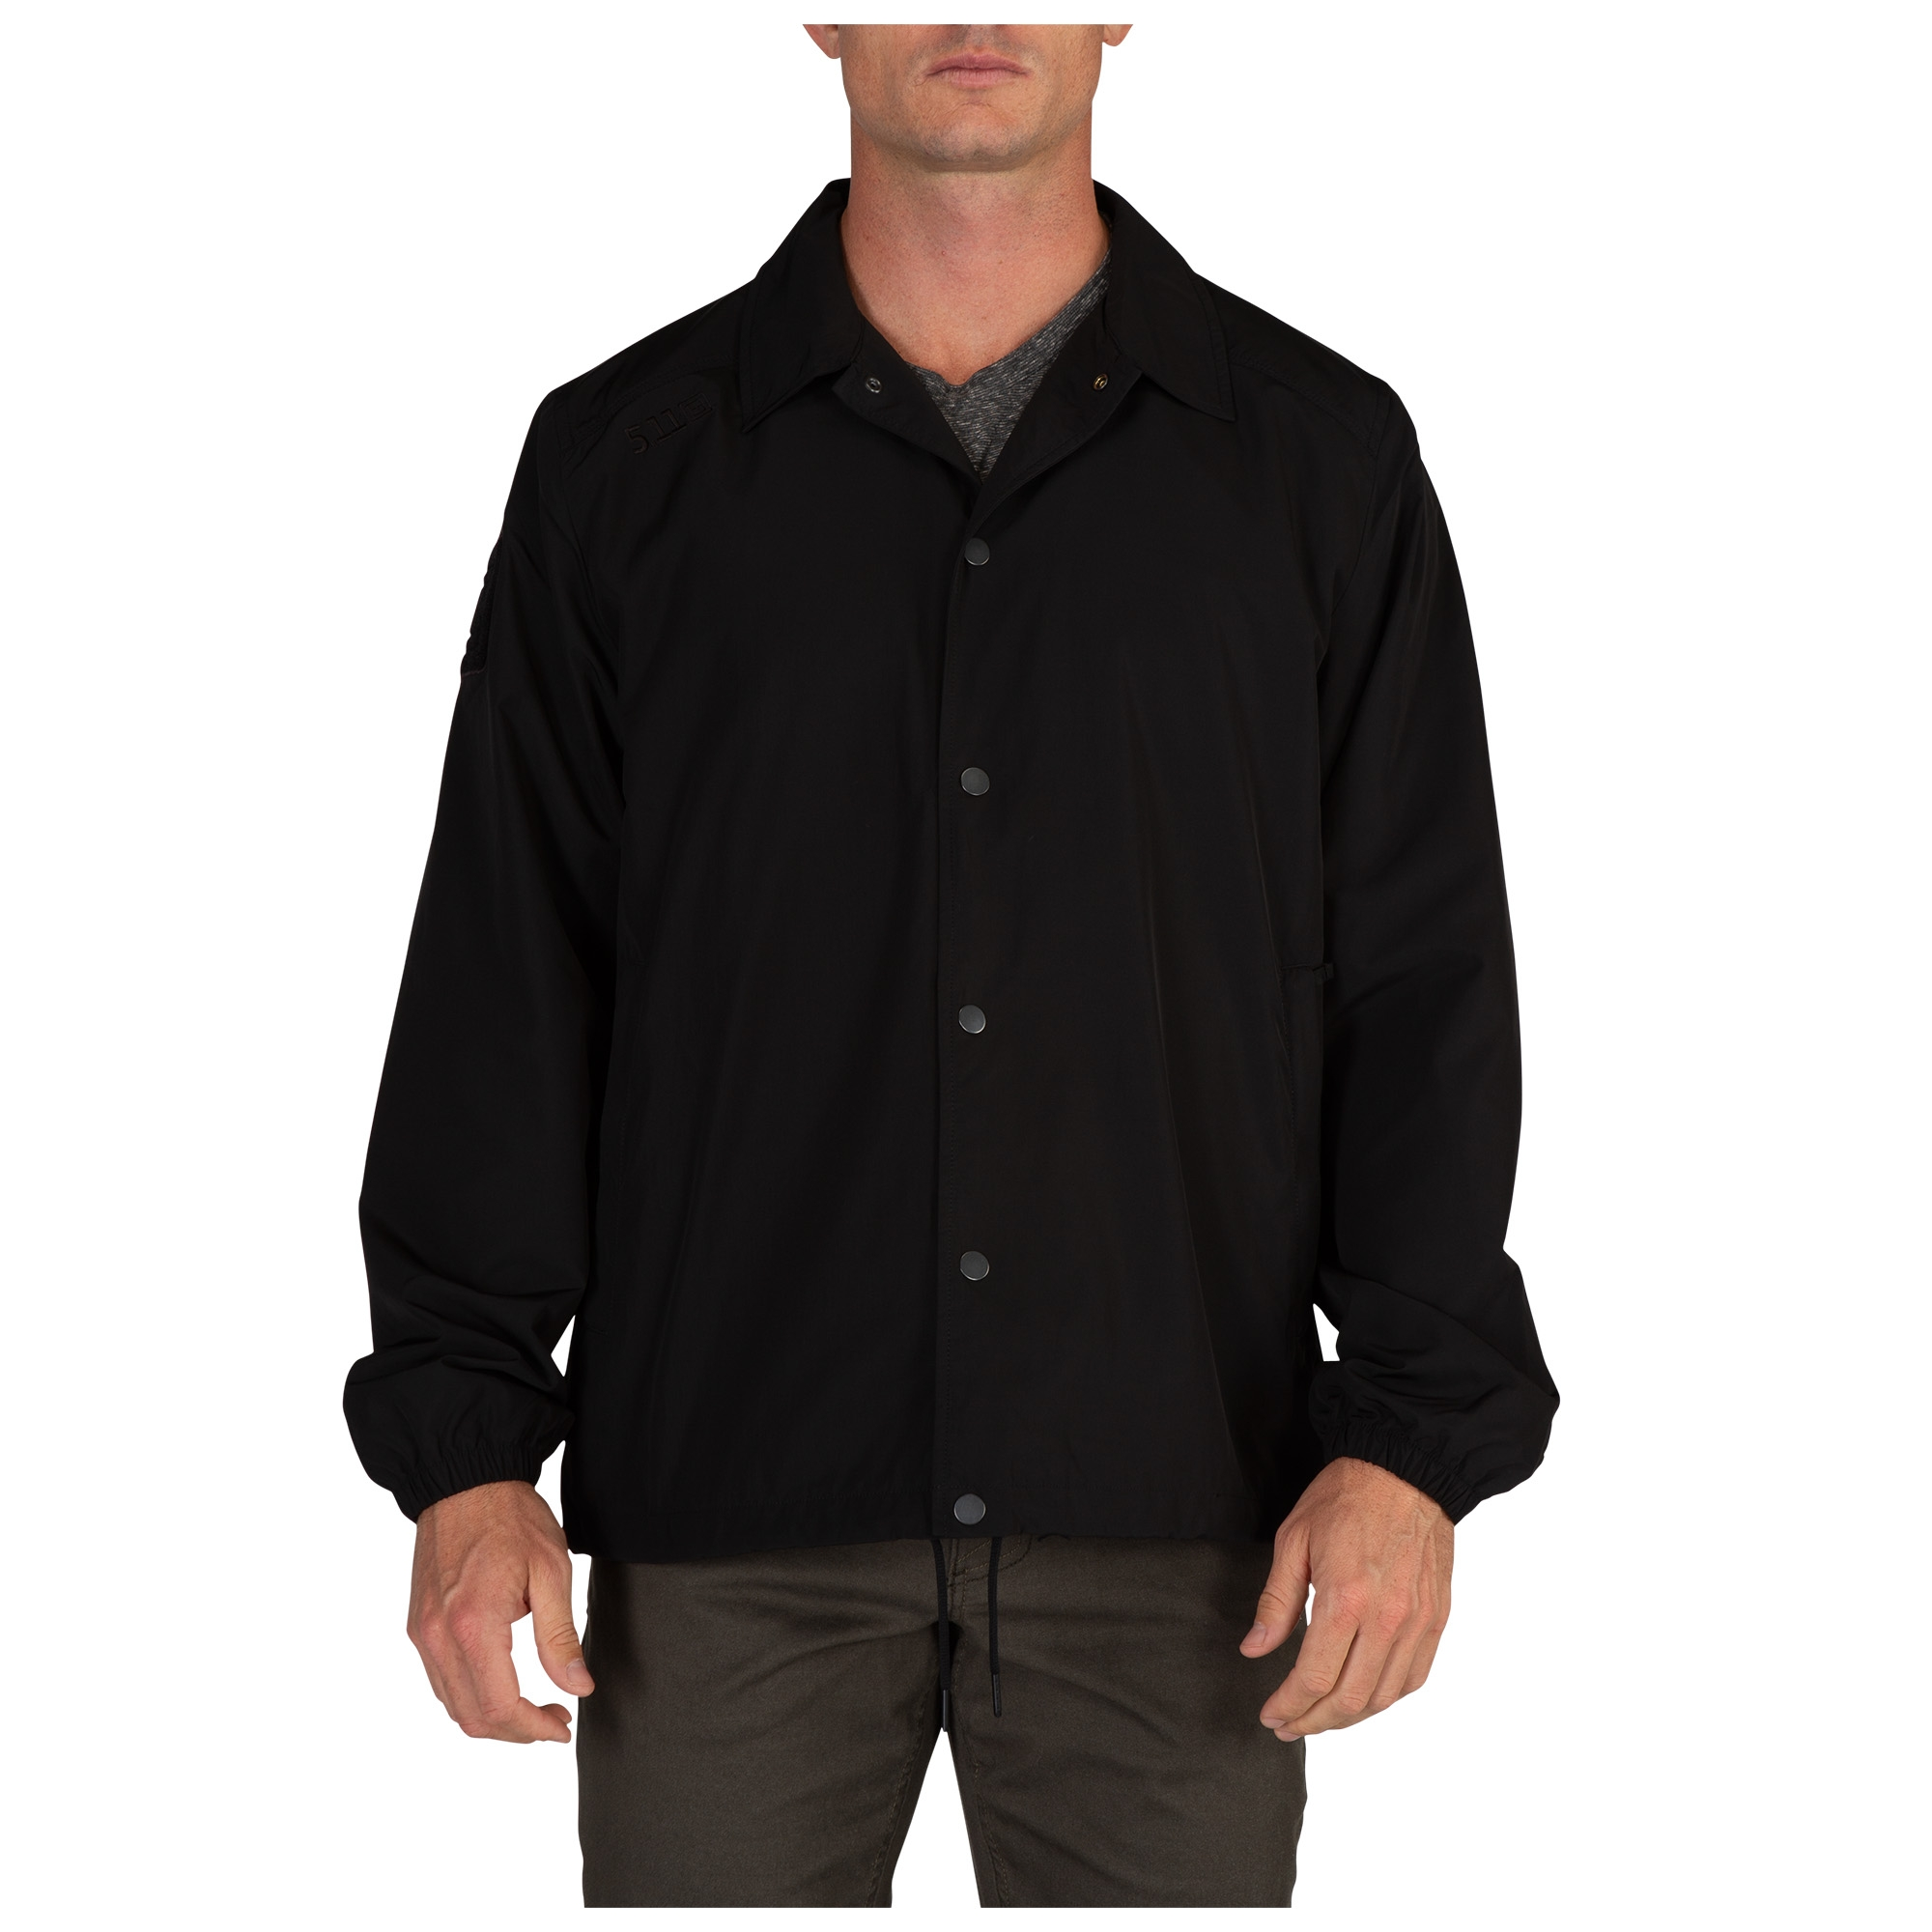 5.11 Tactical Men's Raghorn Coaches Jacket (Black)